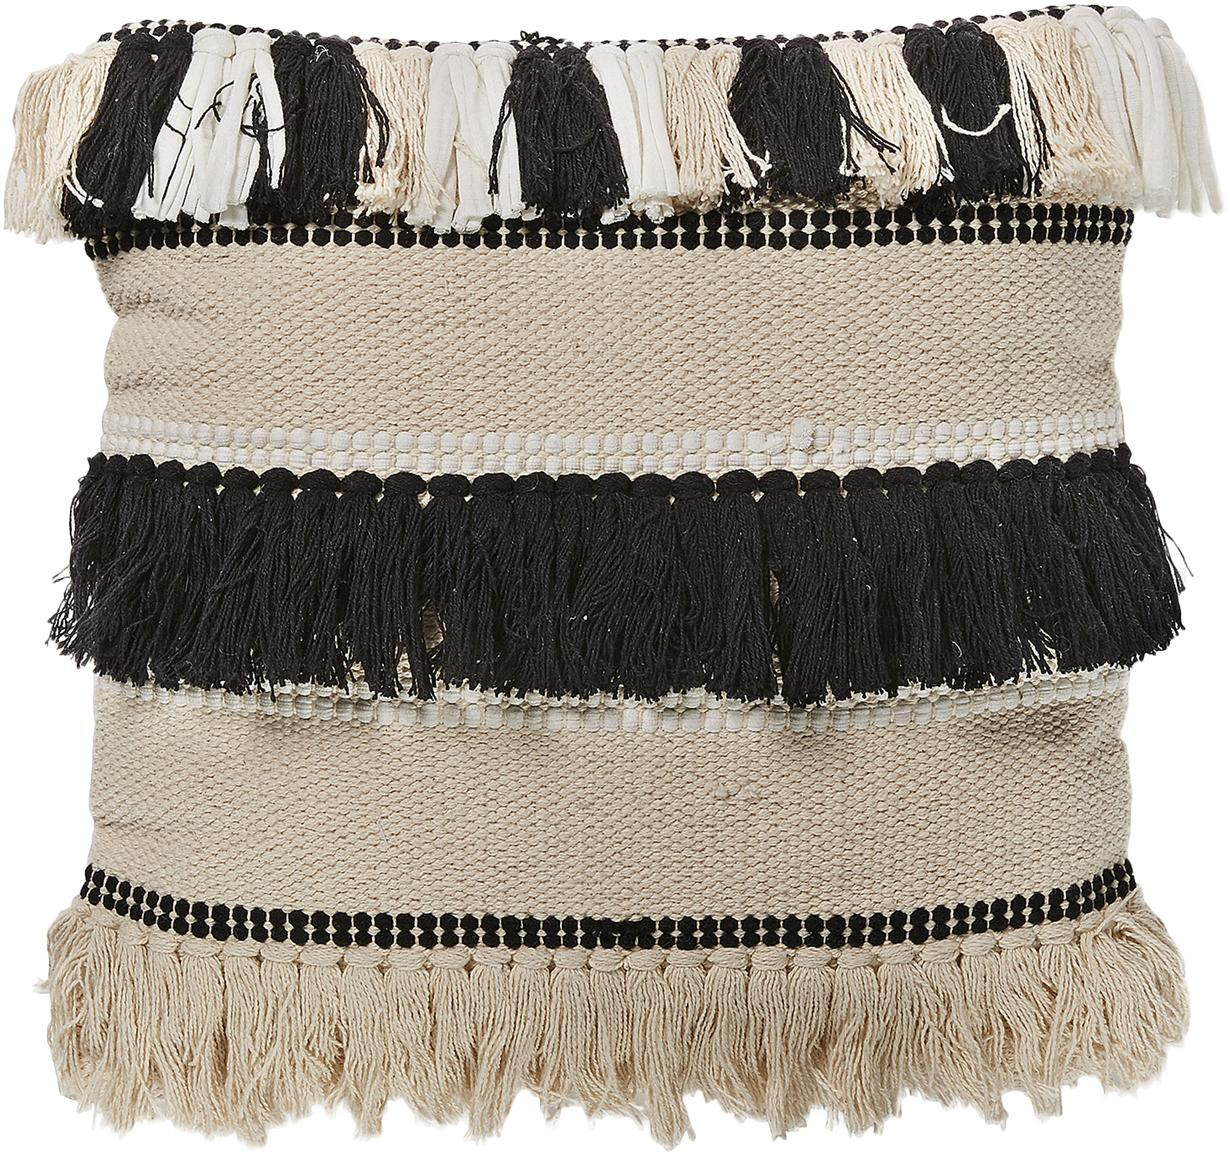 Boho kussenhoes Franny met franjes, Katoen, Wit, ecru, zwart, 45 x 45 cm